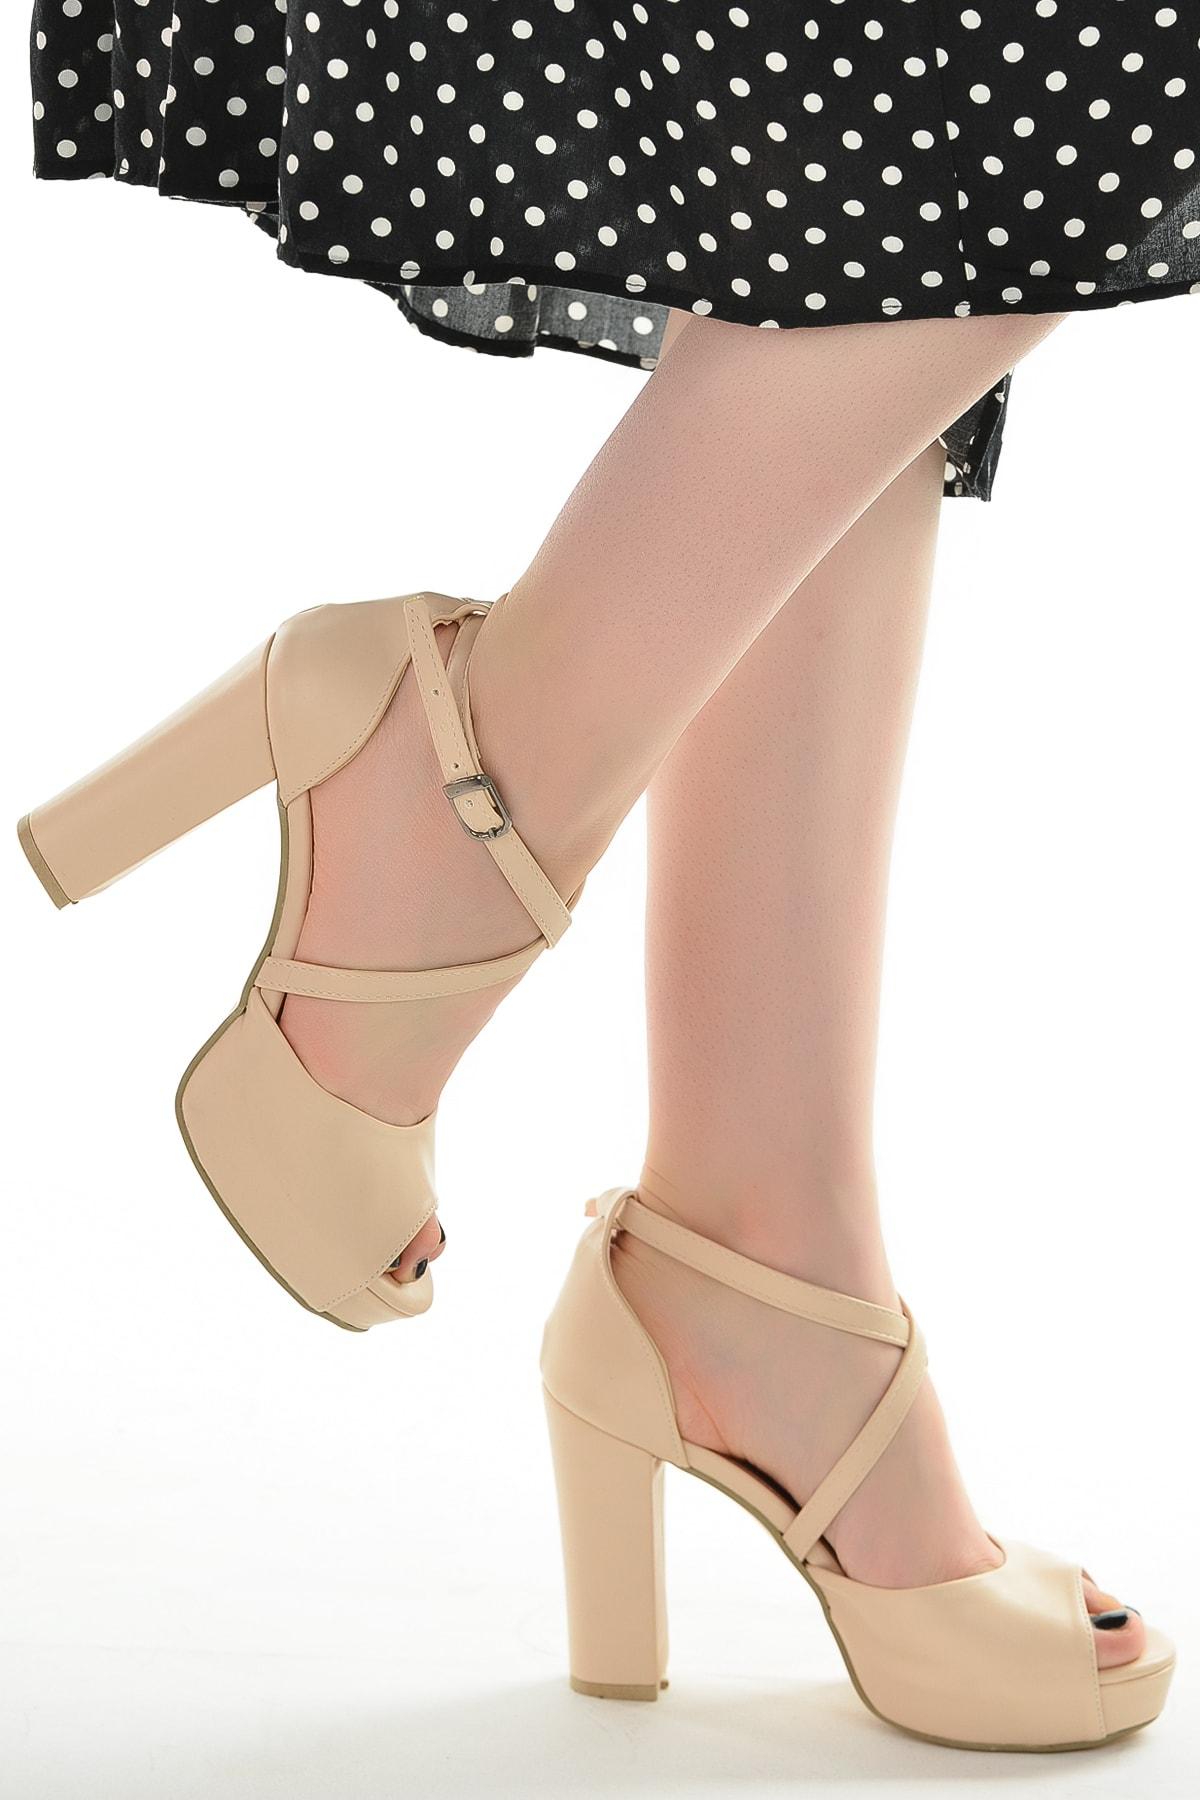 Ayakland Kadın Ten Platform Topuklu Ayakkabı 11 cm 3210-2058 2